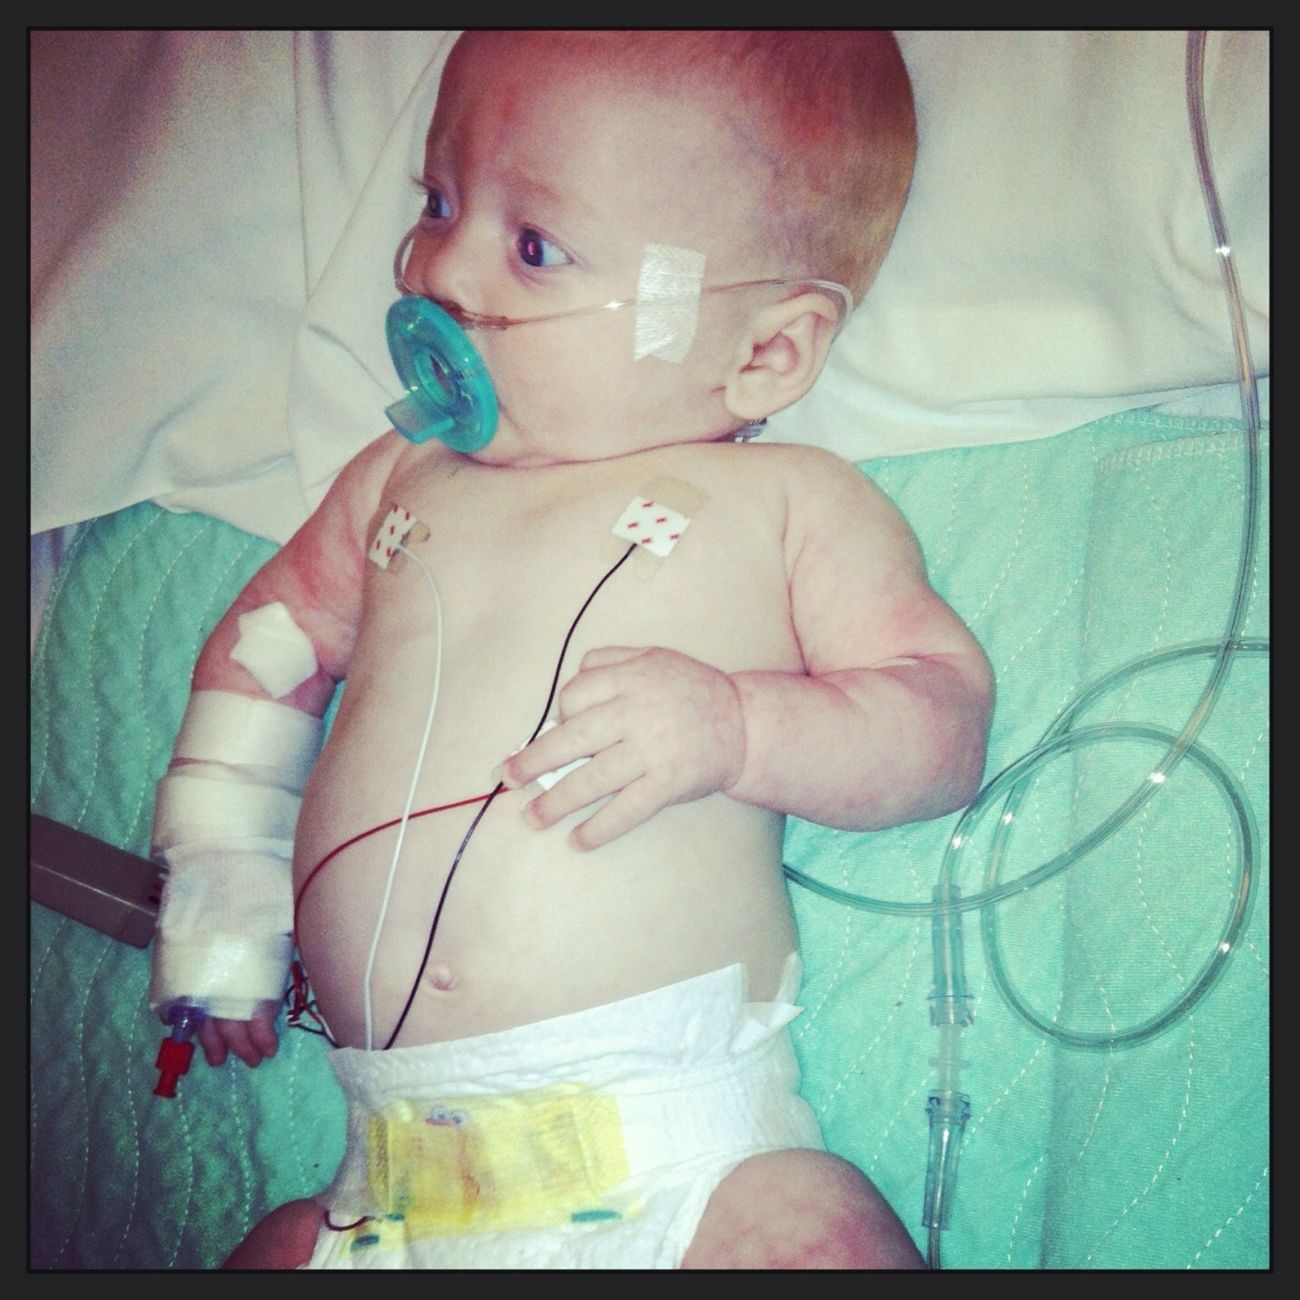 Sick Baby, Hospital :/